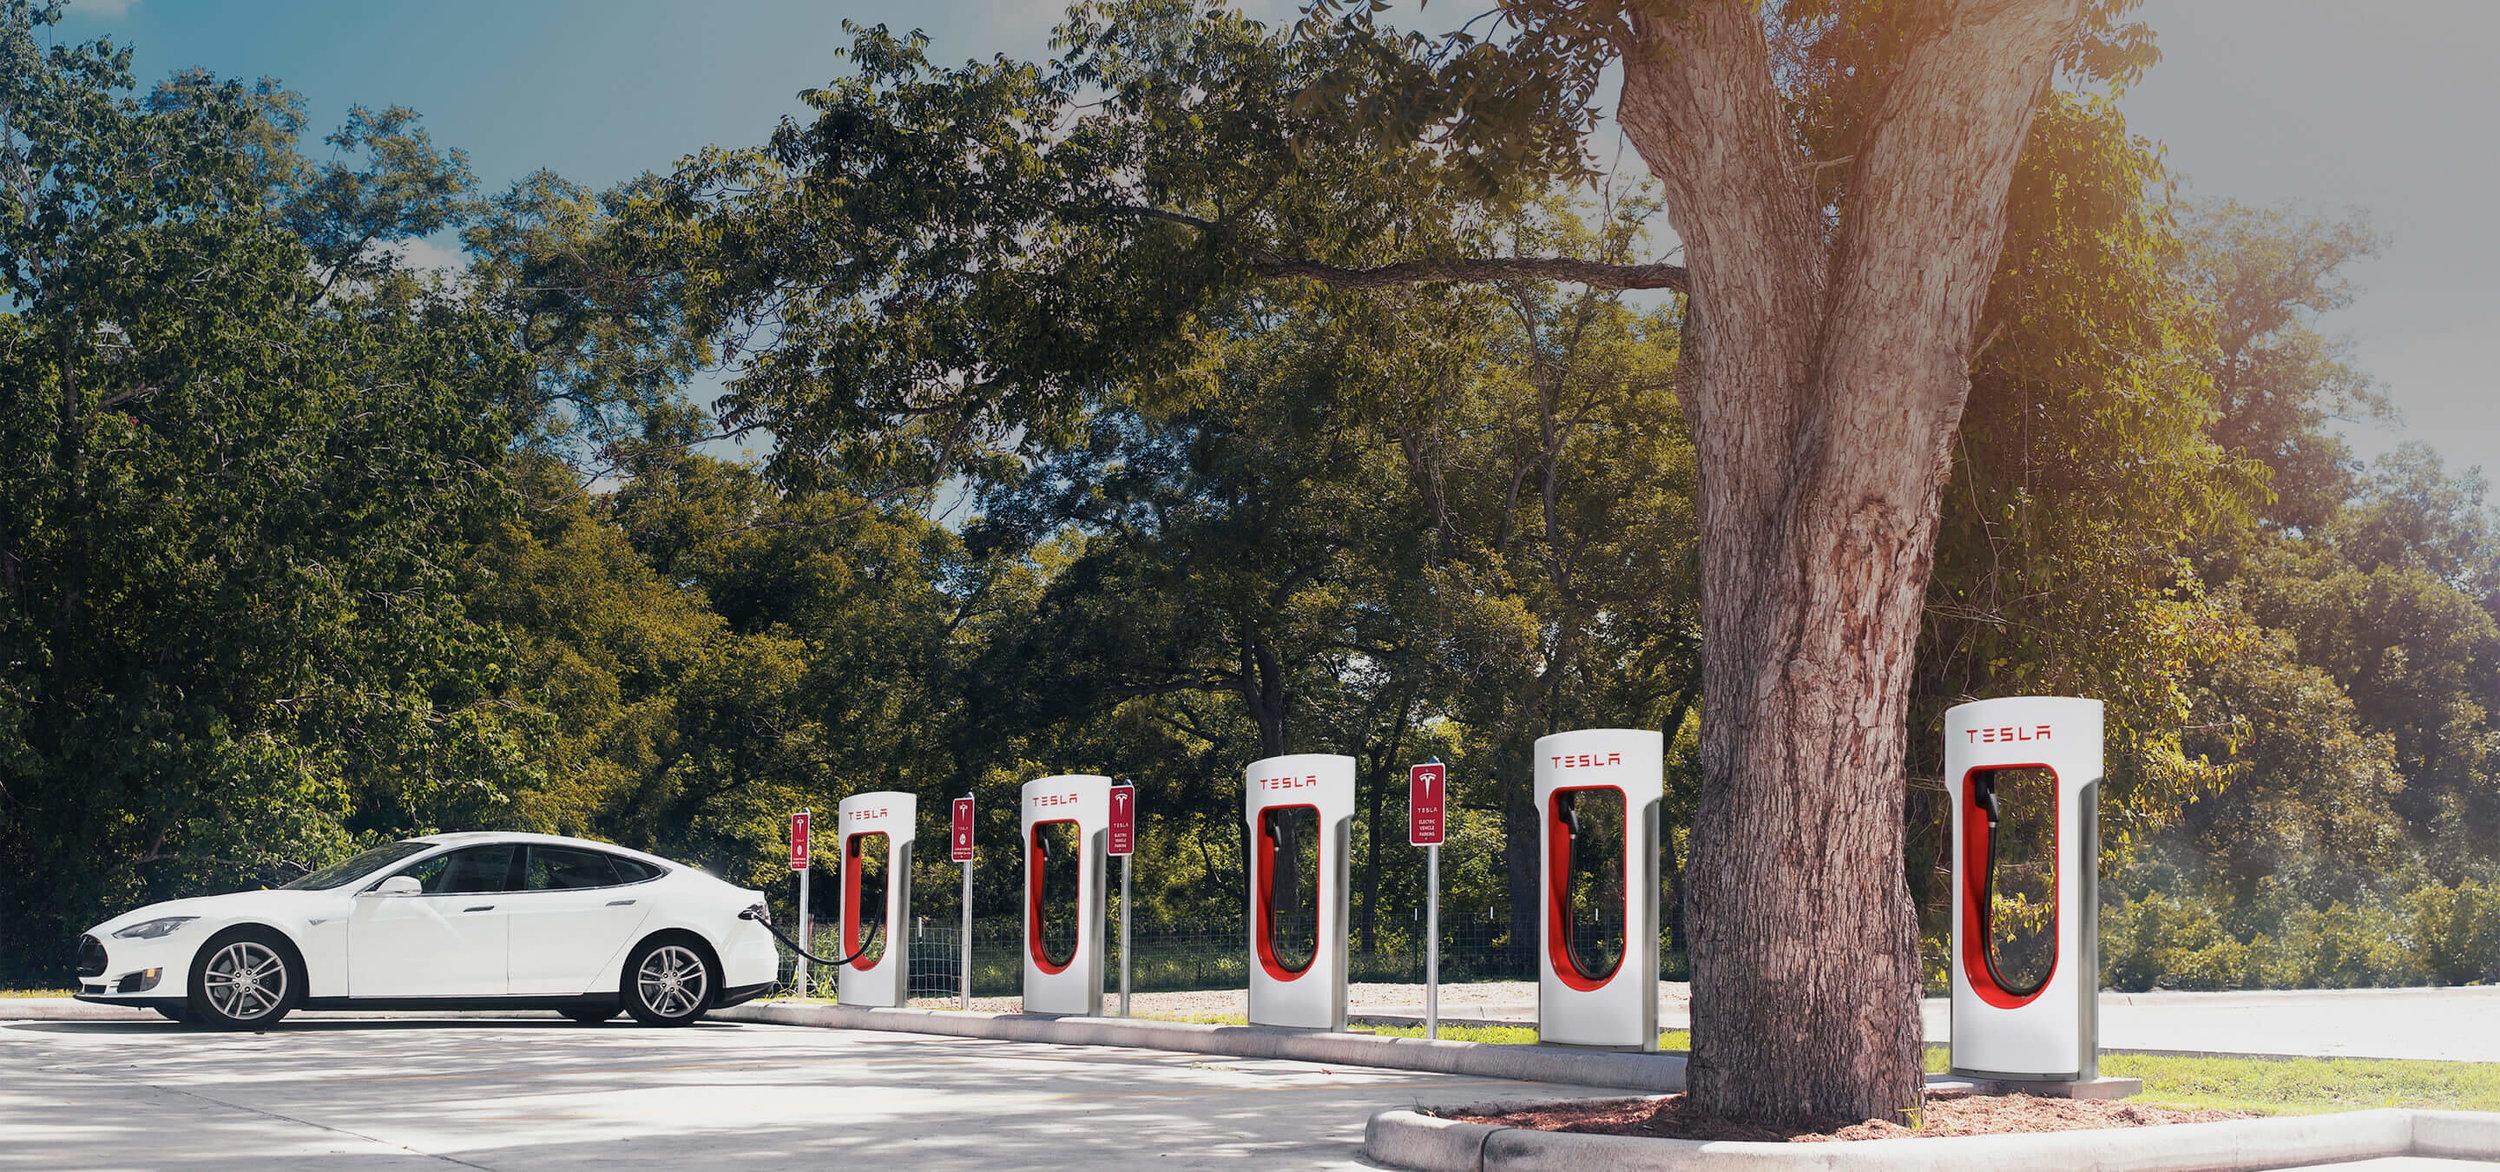 | Source: Tesla | Tesla Model S charing at a Super Charger